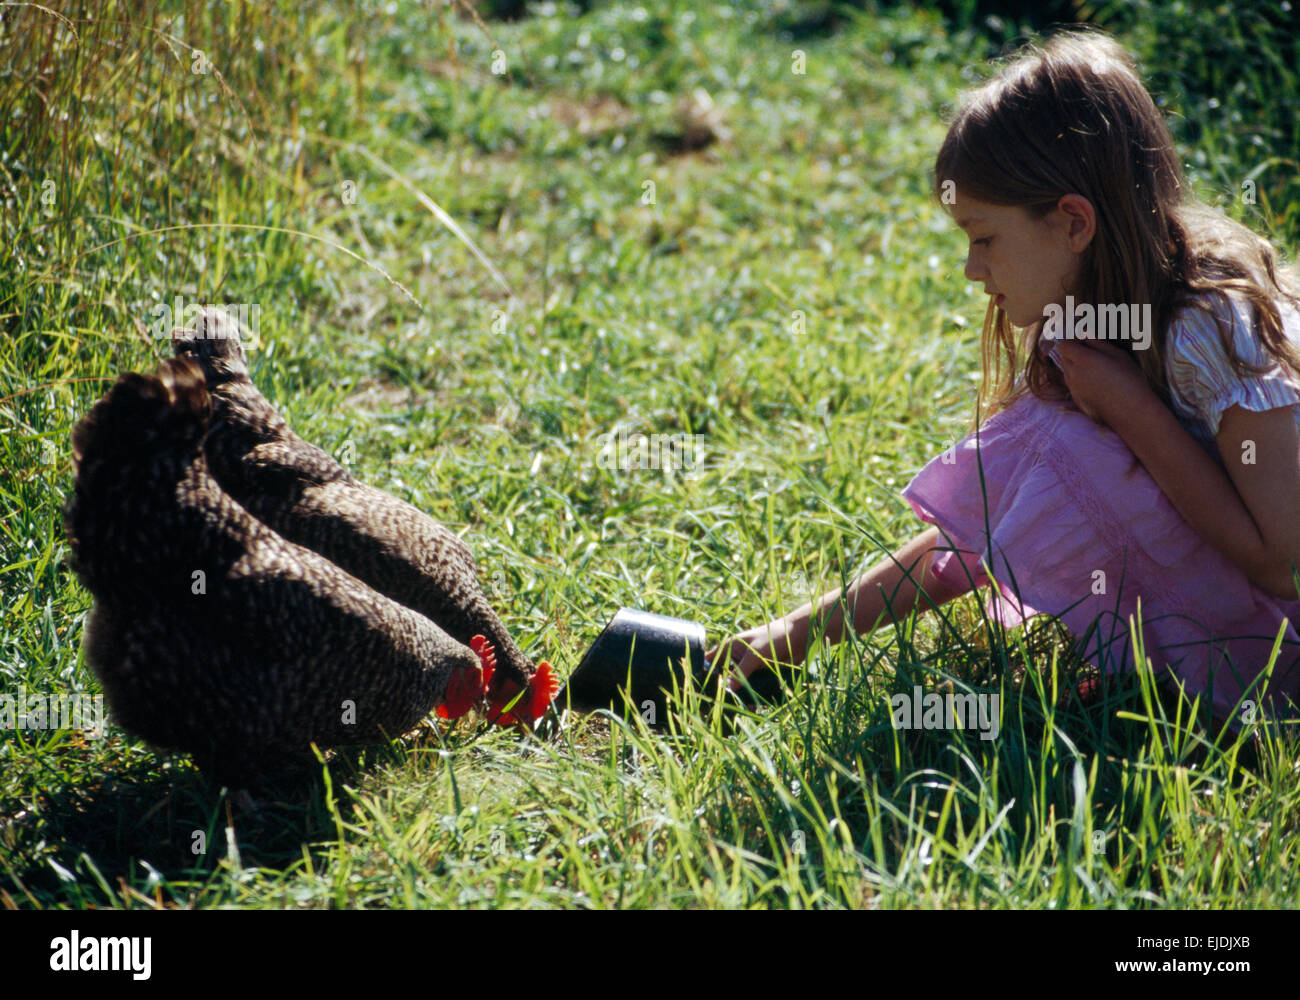 Small girl feeding black hens - Stock Image